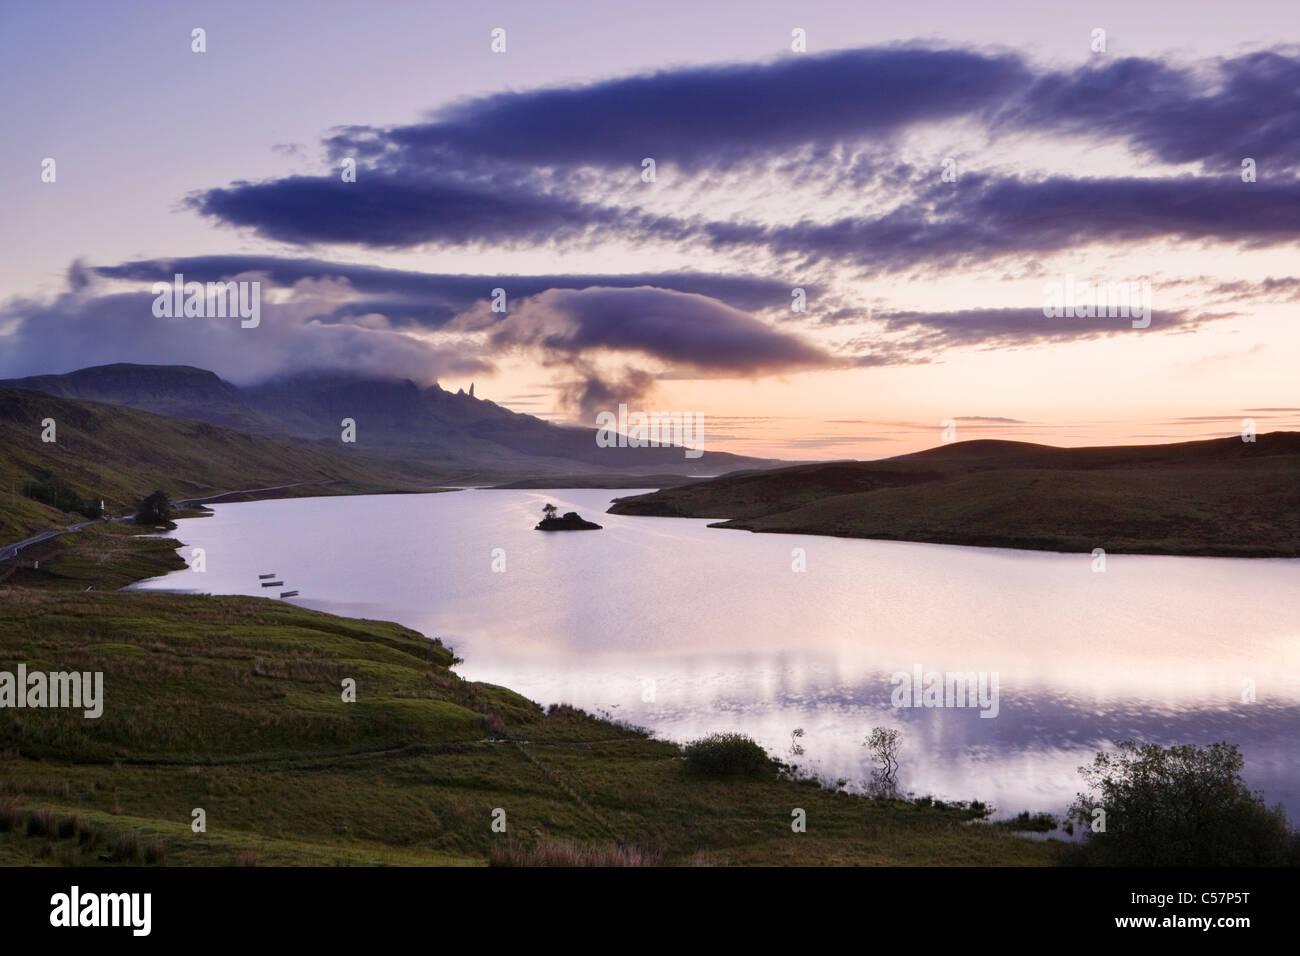 The Old Man of Storr over Loch Fada, Isle of Skye, Scotland, UK. Dawn. Stock Photo